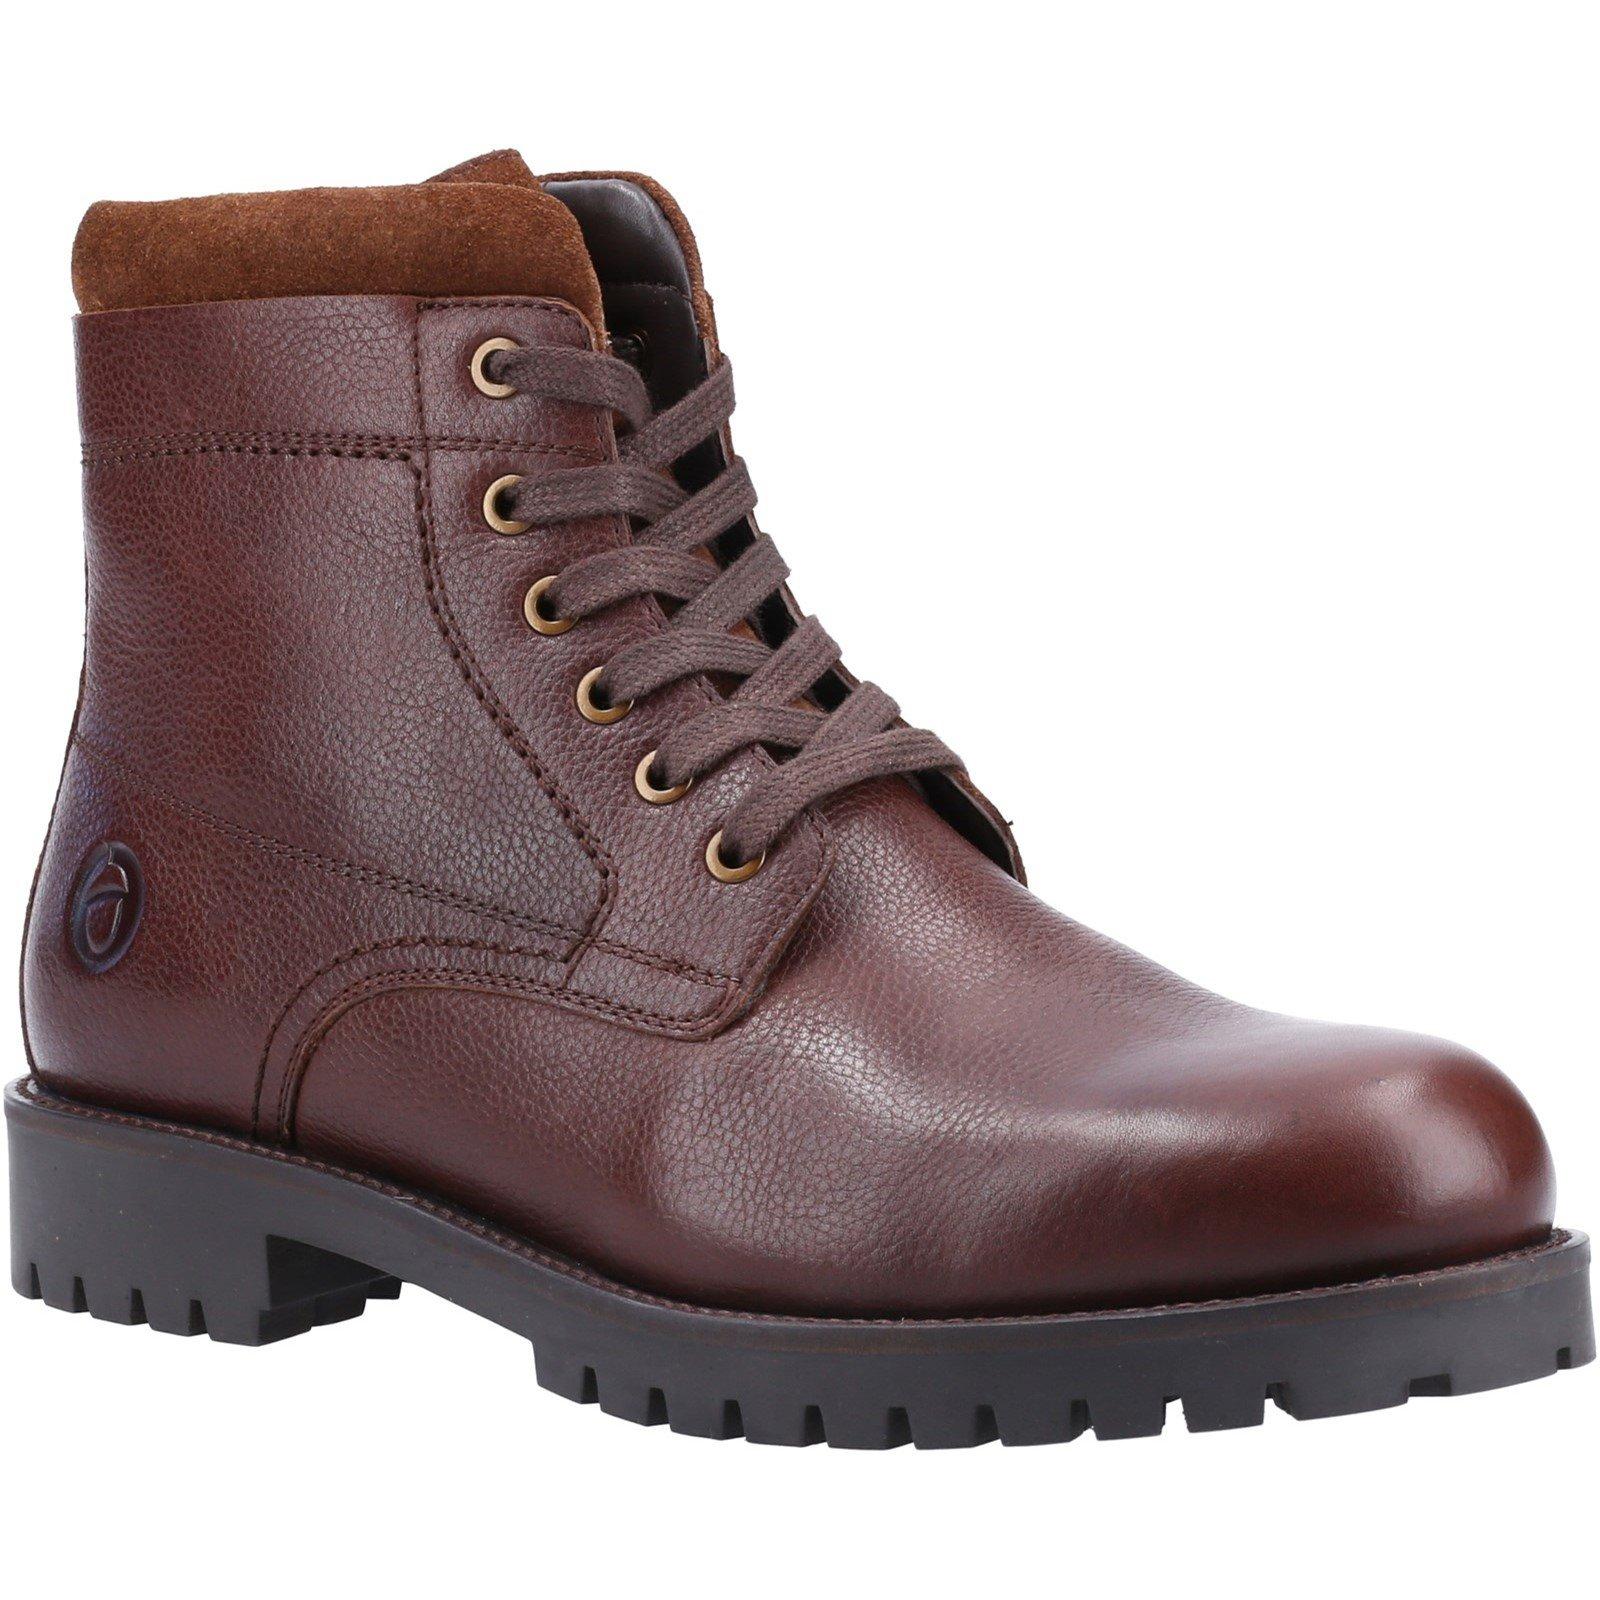 Cotswold Men's Thorsbury Lace Up Shoe Boot Various Colours 32963 - Brown 7